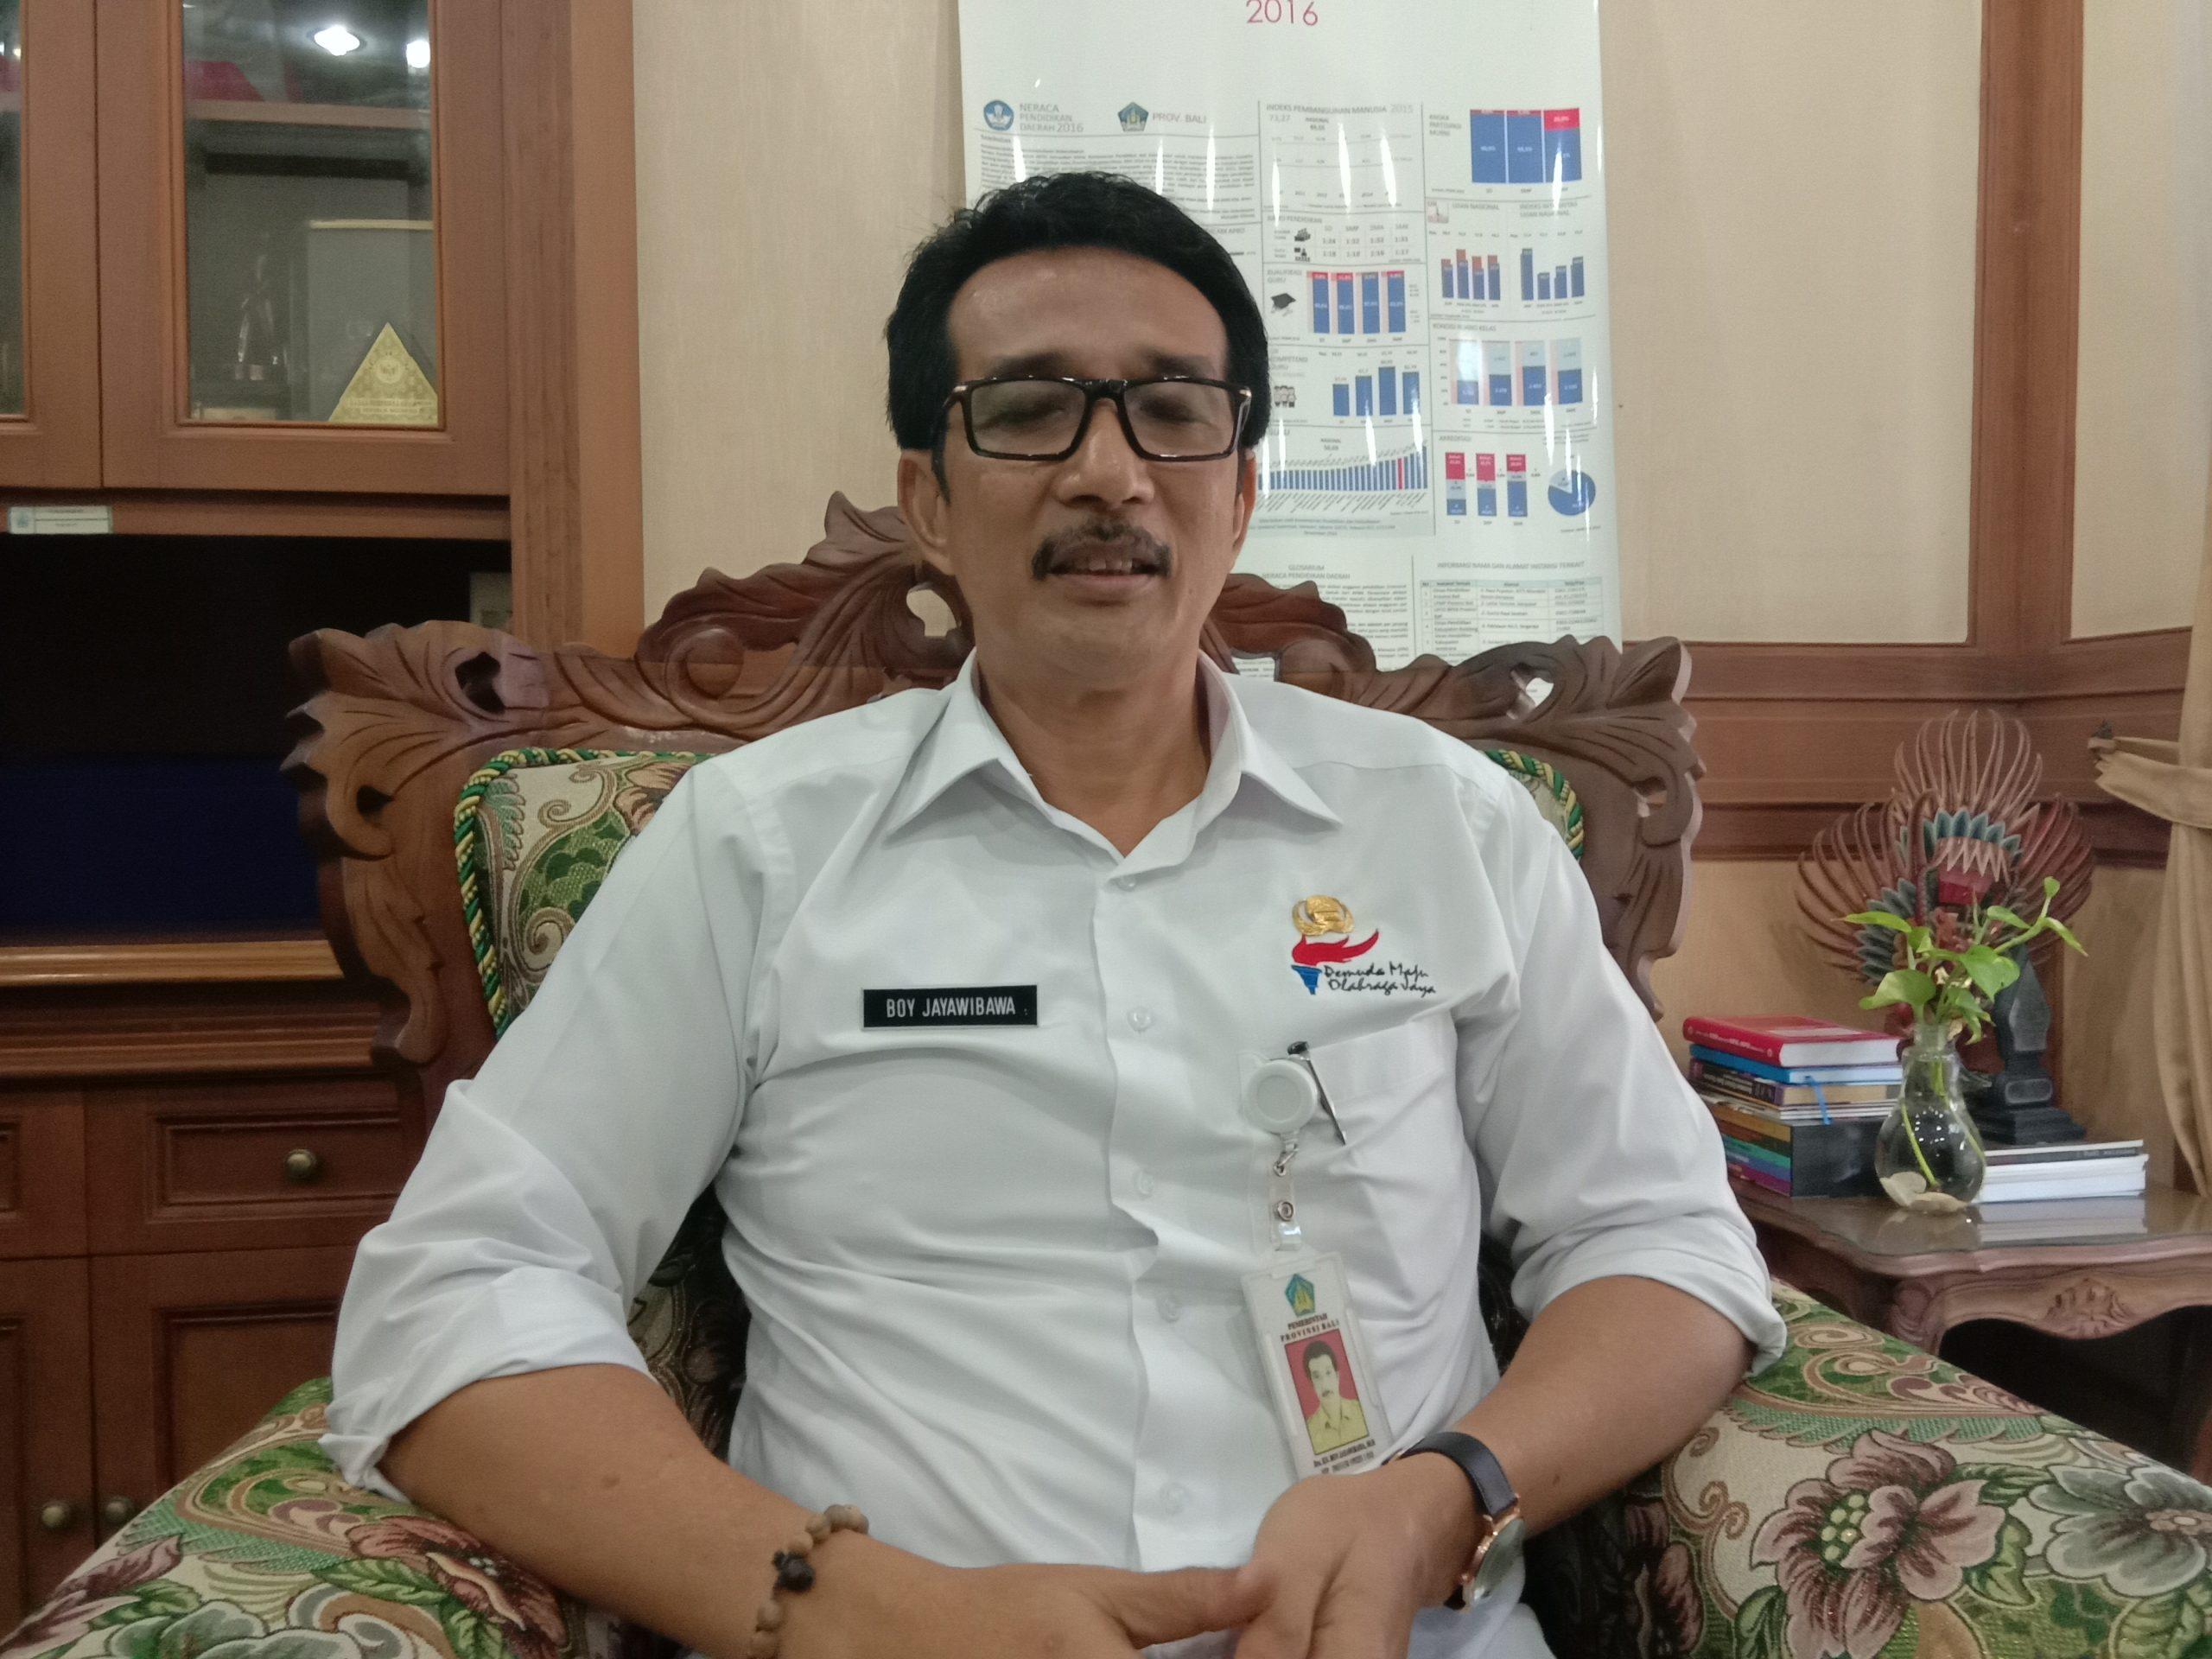 IKN Boy Jayawibawa